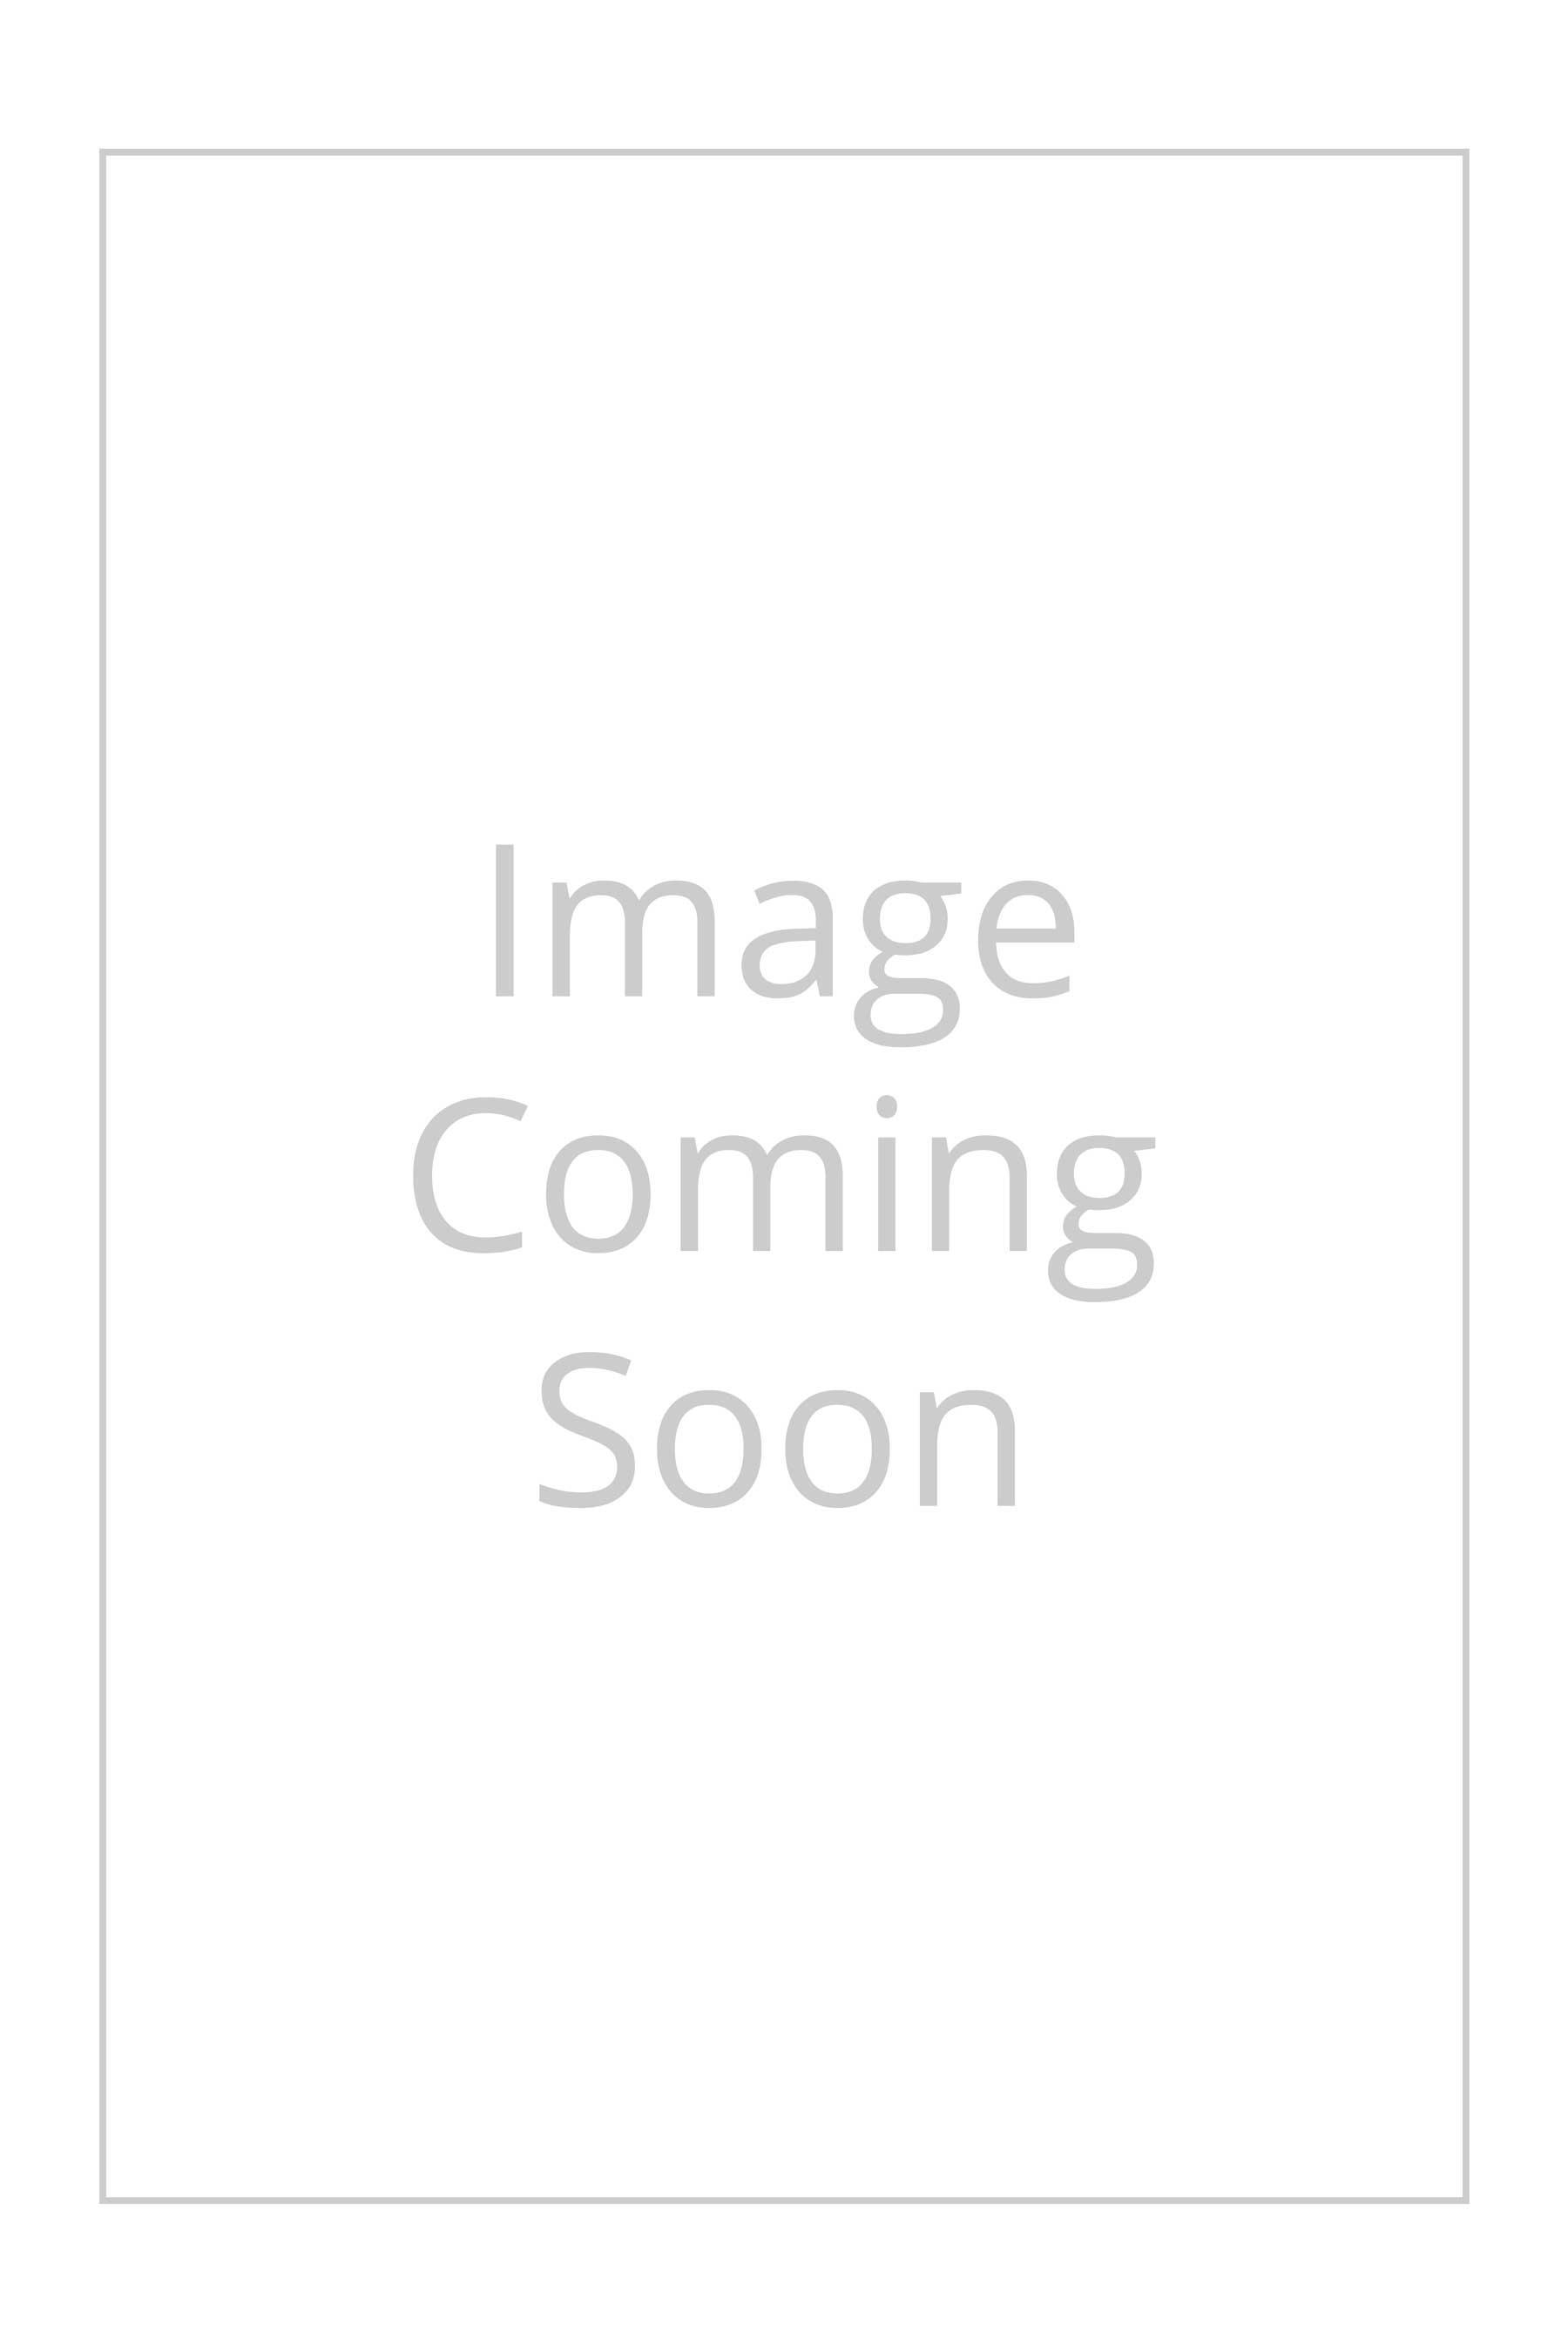 St. John Striped Tweed Jacket w/ Fringe in Caviar & White